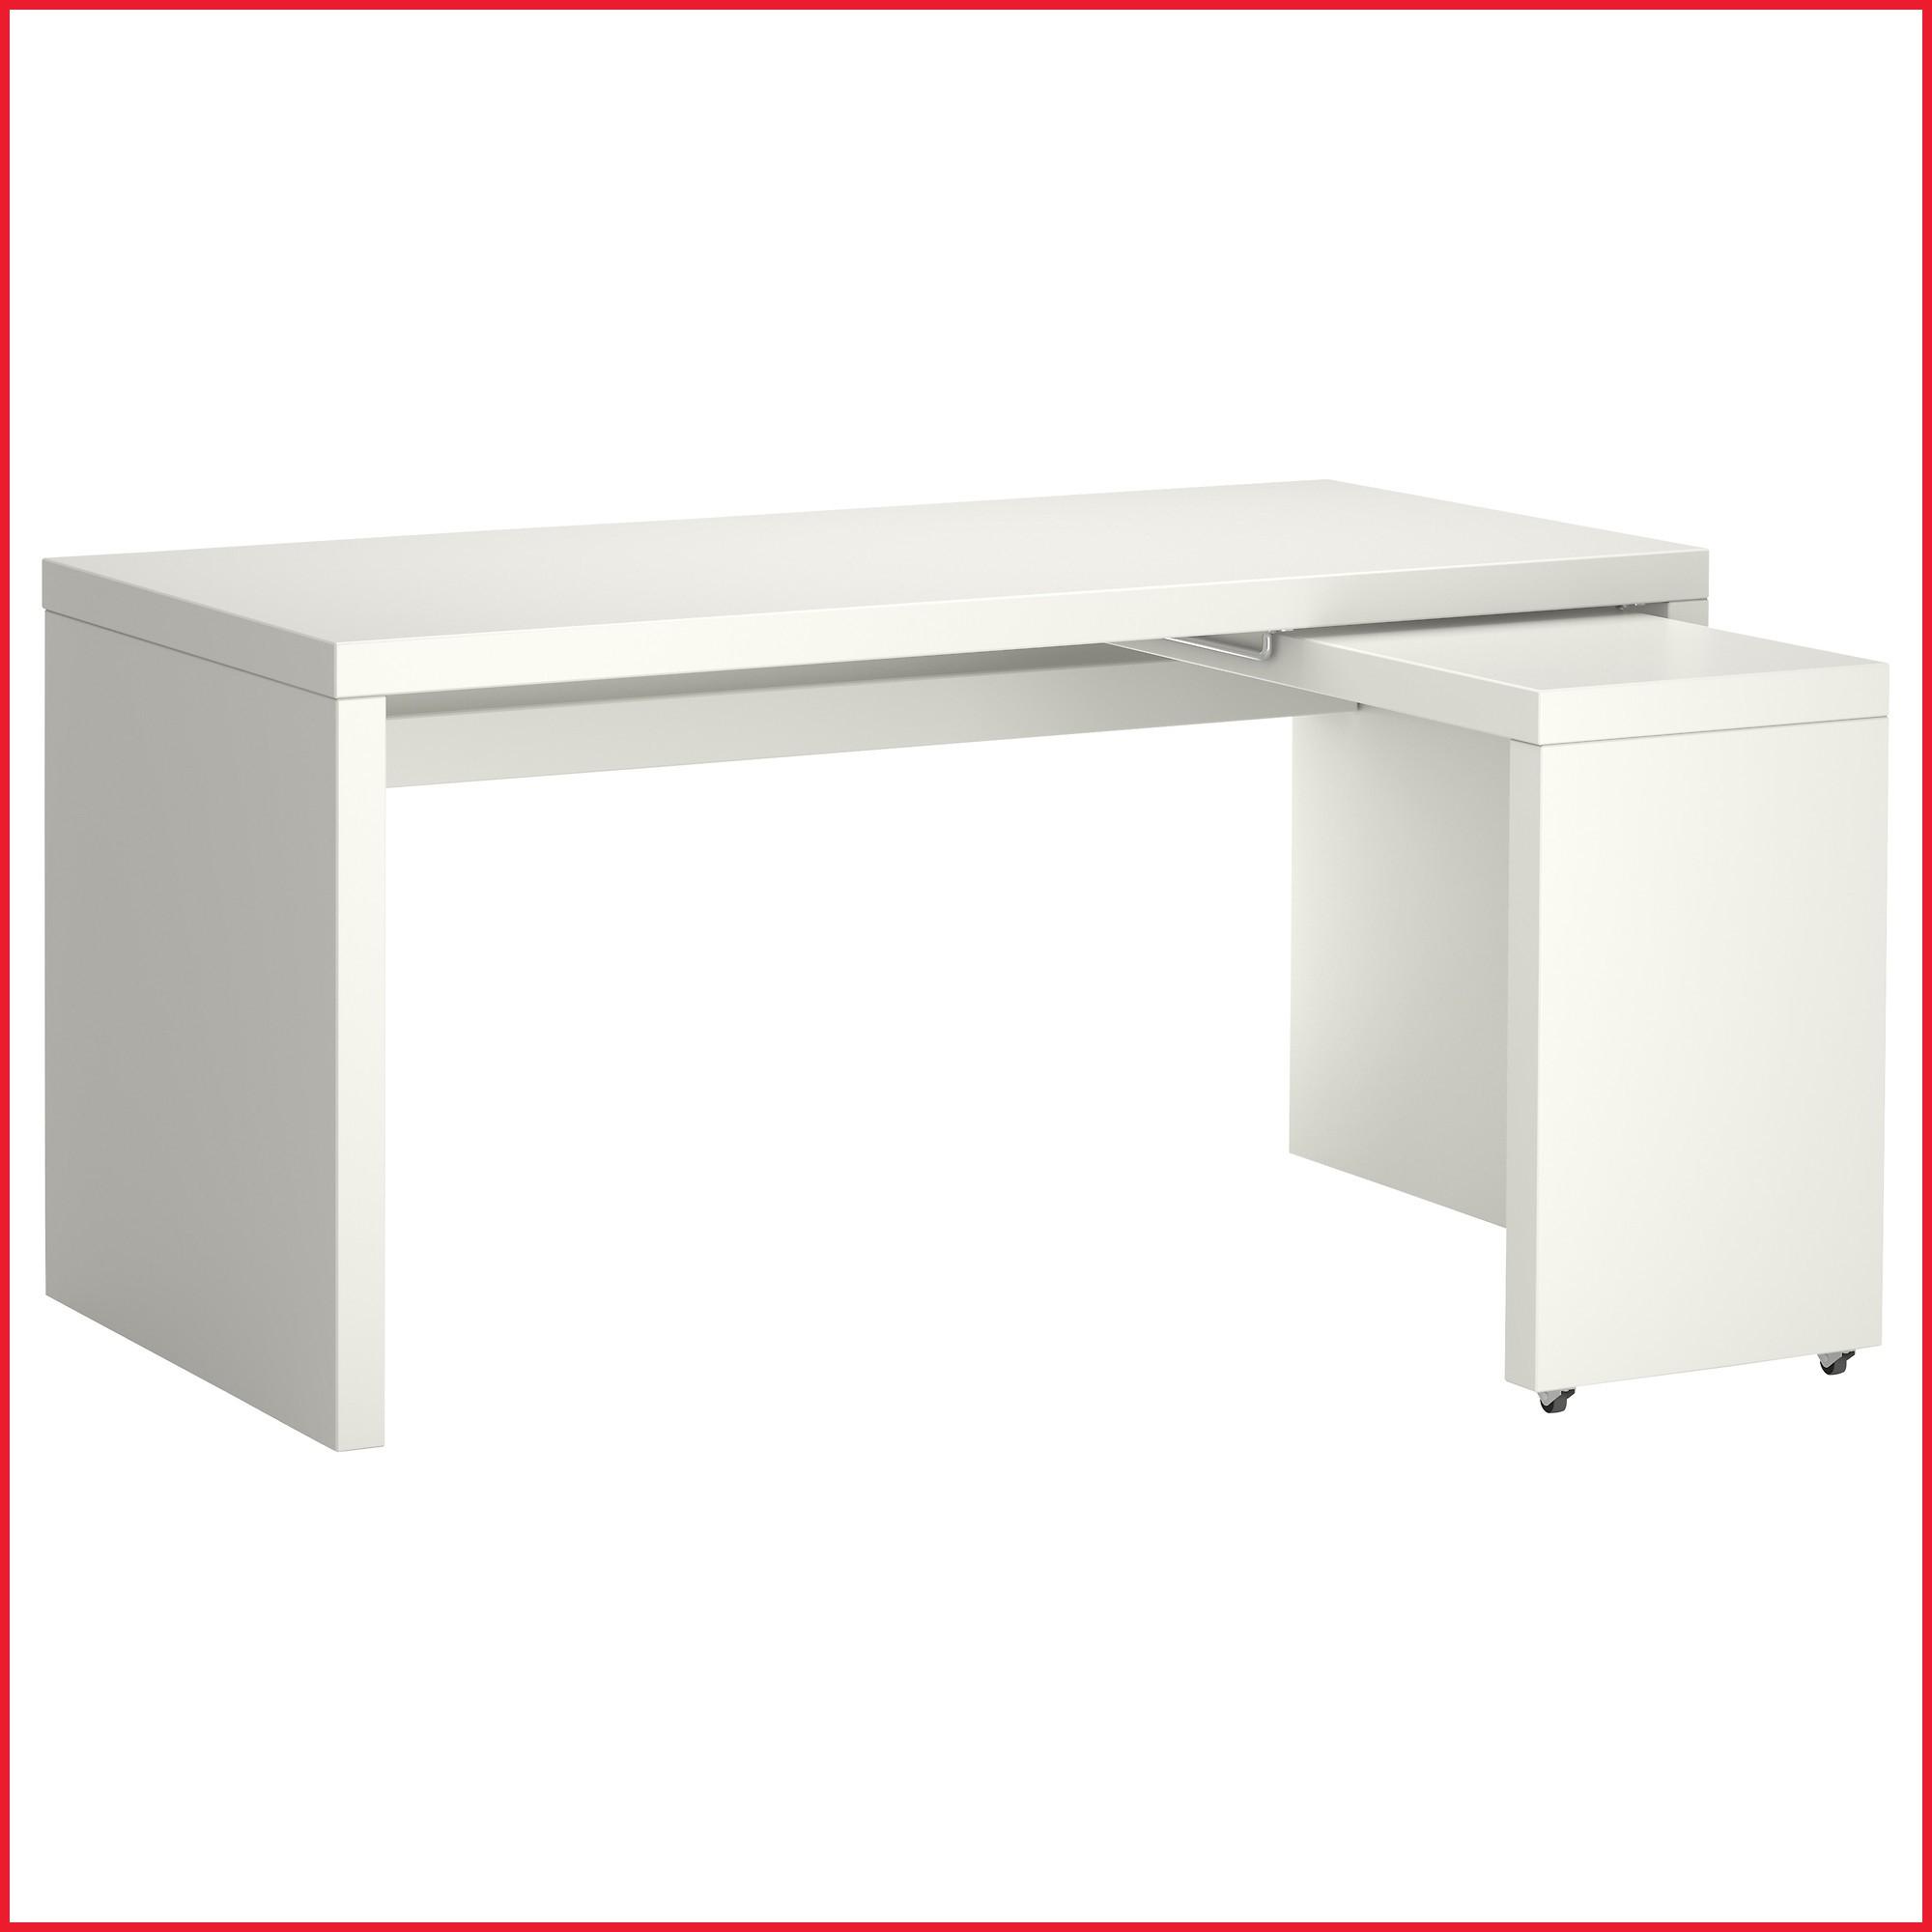 Mesa Trabajo Ikea Ipdd Mesa Trabajo Ikea Malm Escritorio Con Tablero Extrable Blanco